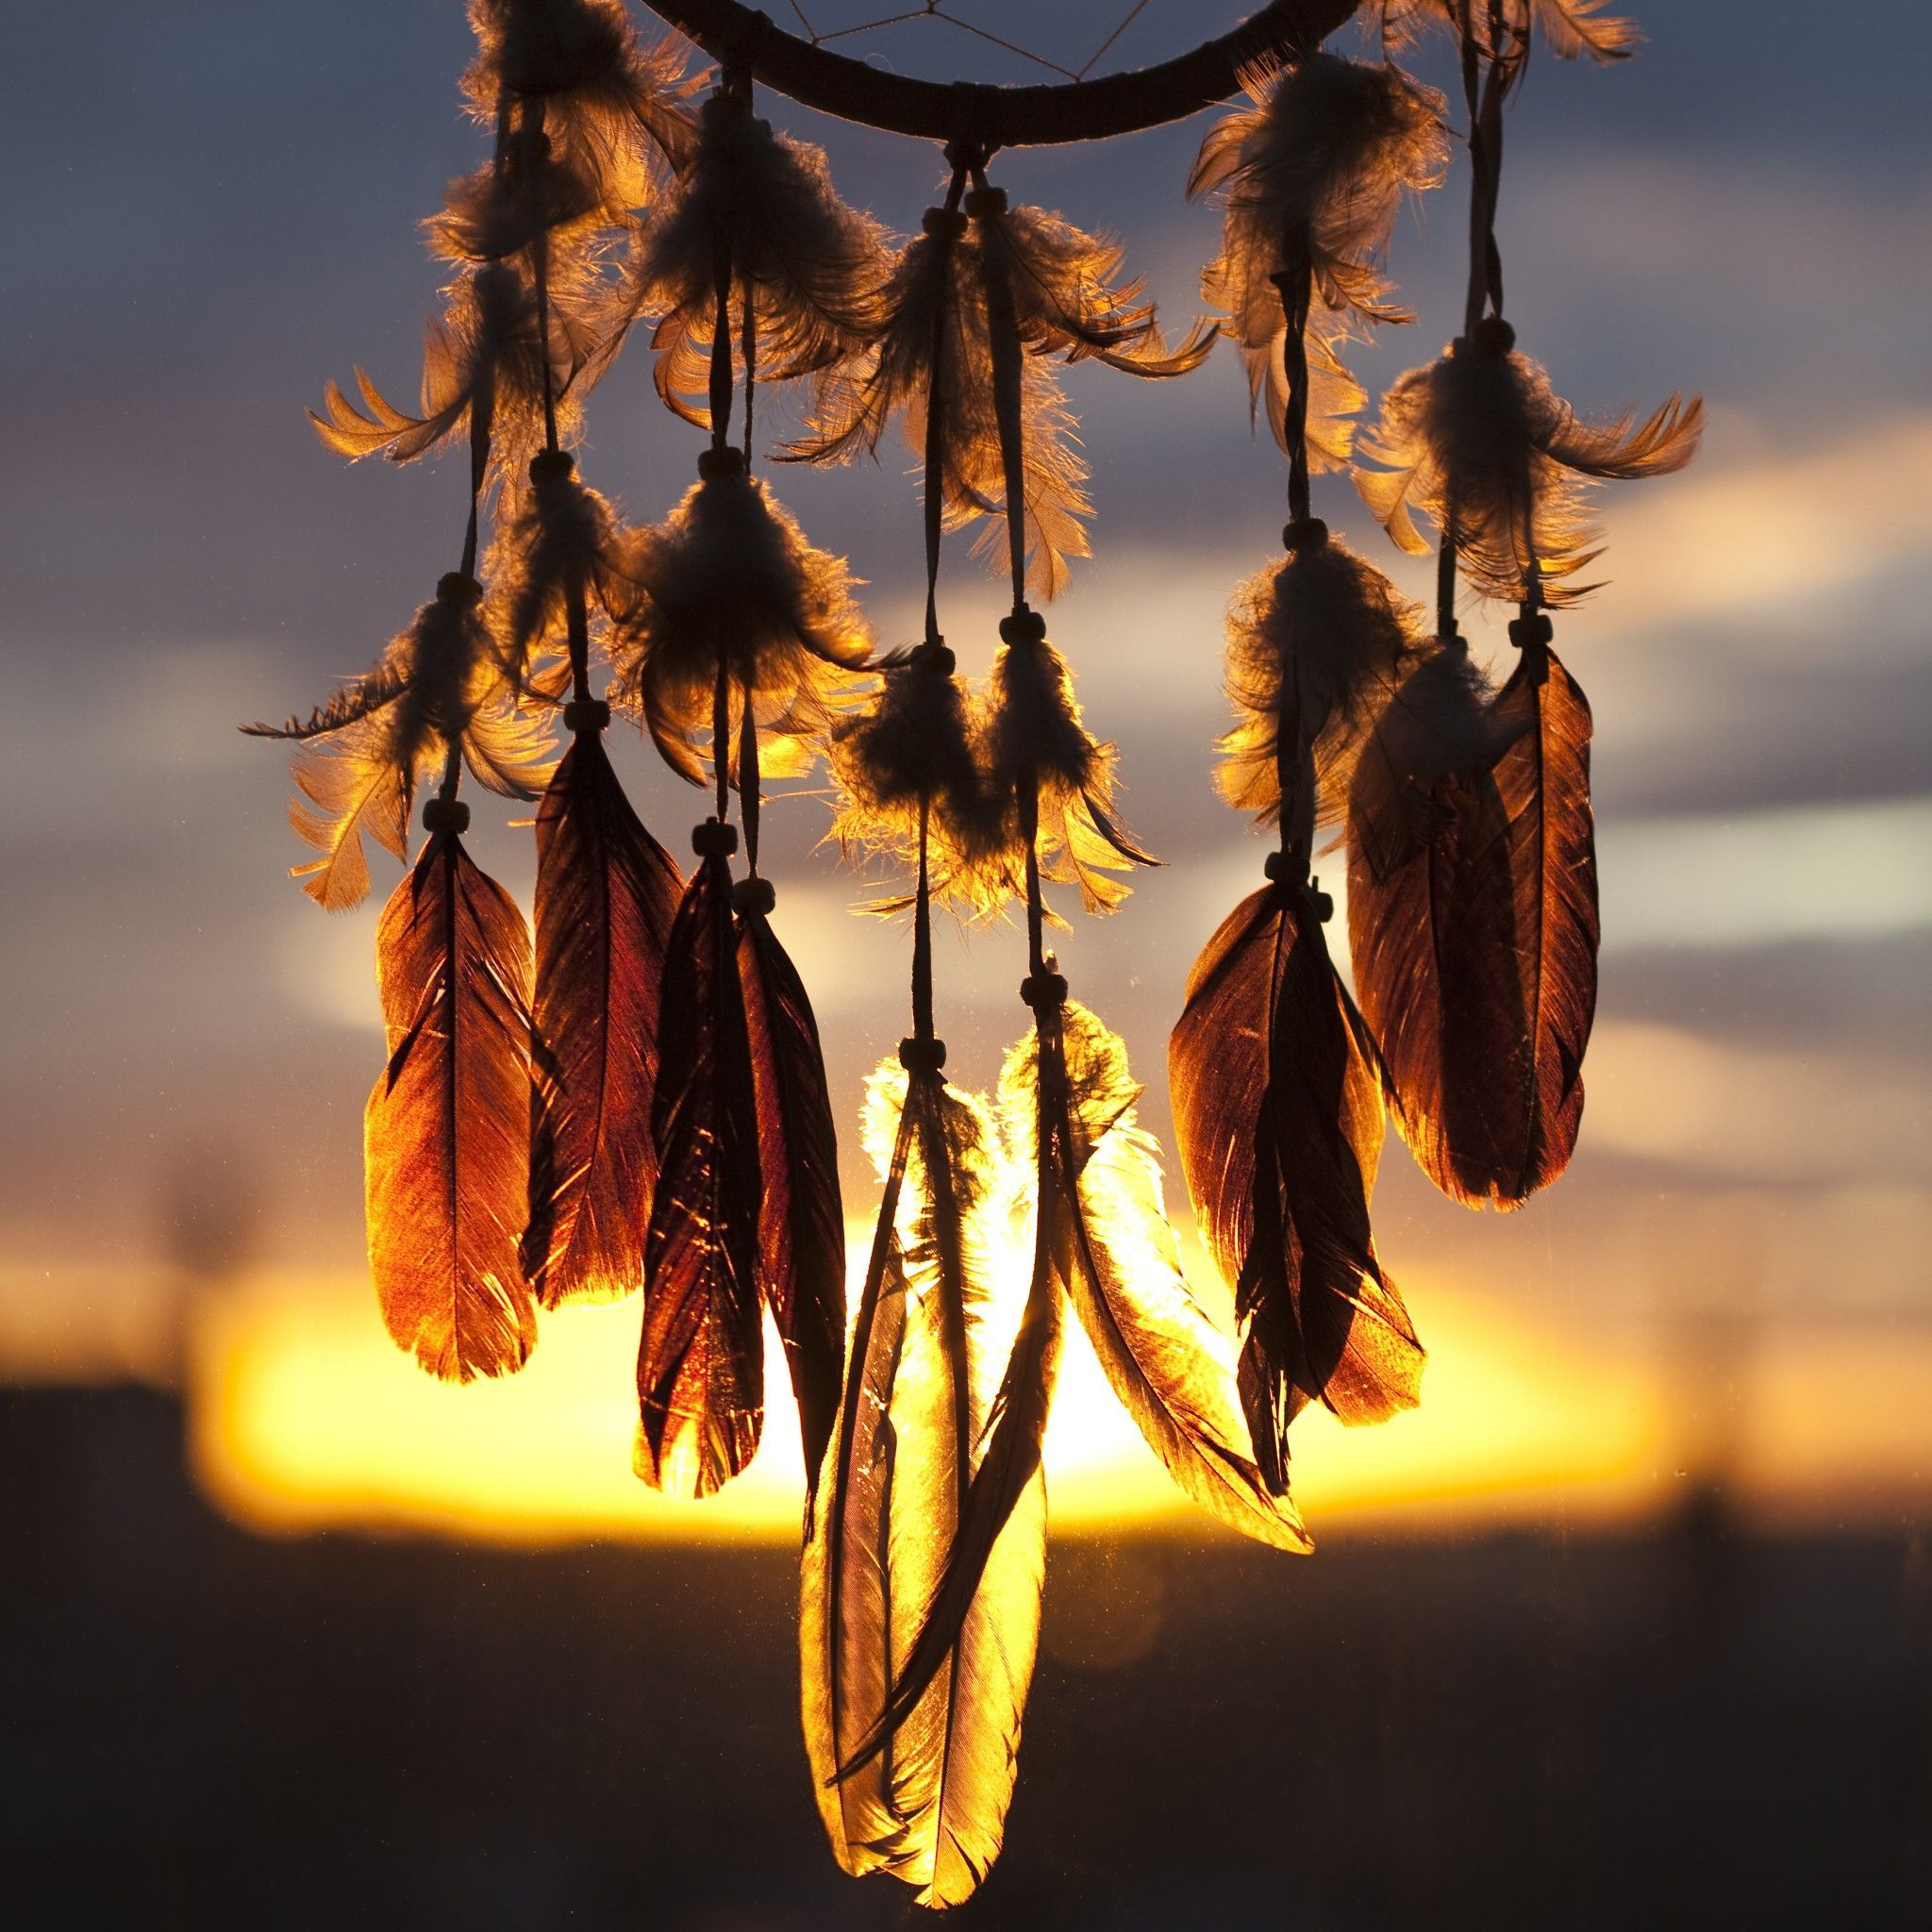 Dream Catcher Native American Wallpapers